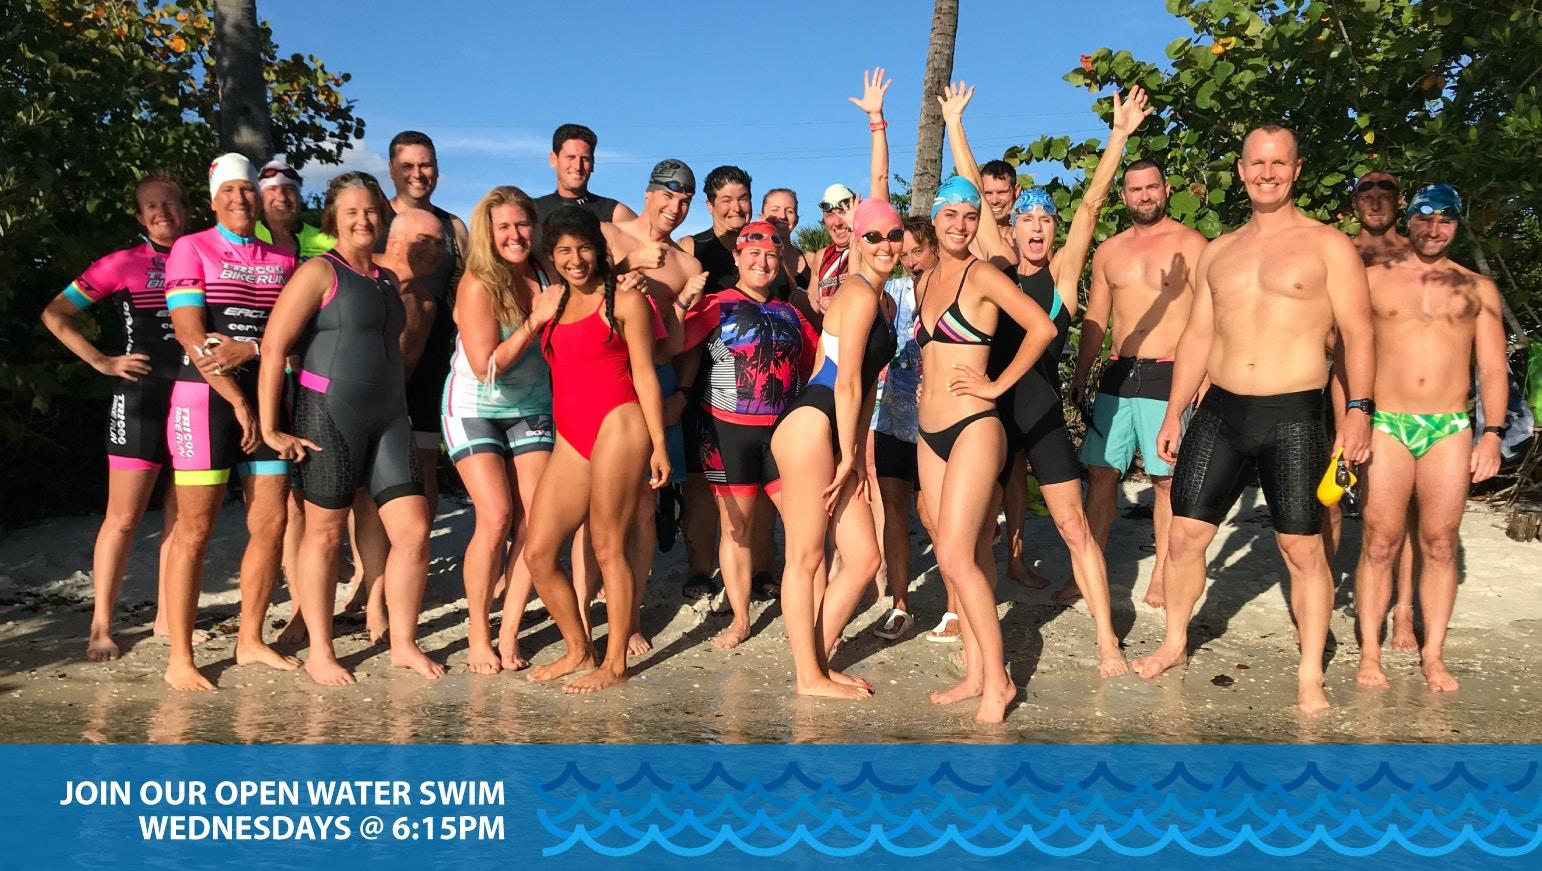 Tri Bike Run Weekly Open Water Swim Group